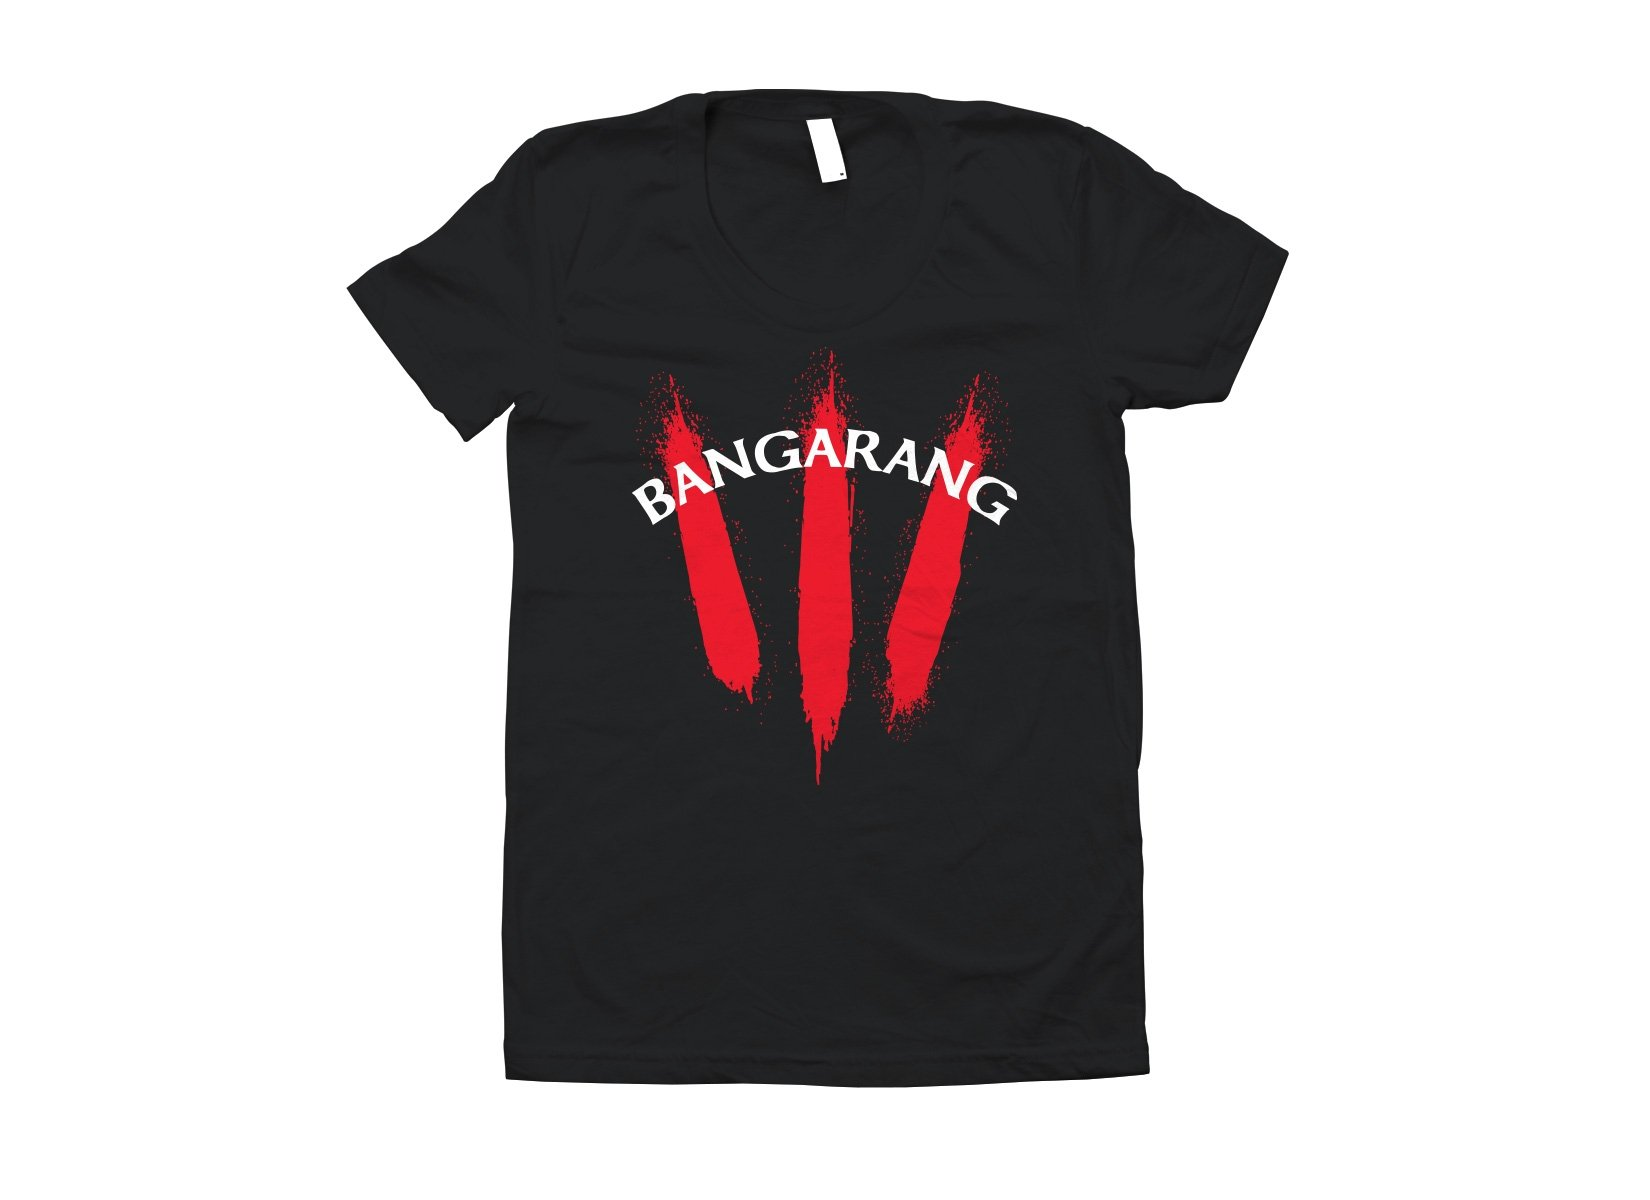 Bangarang on Juniors T-Shirt